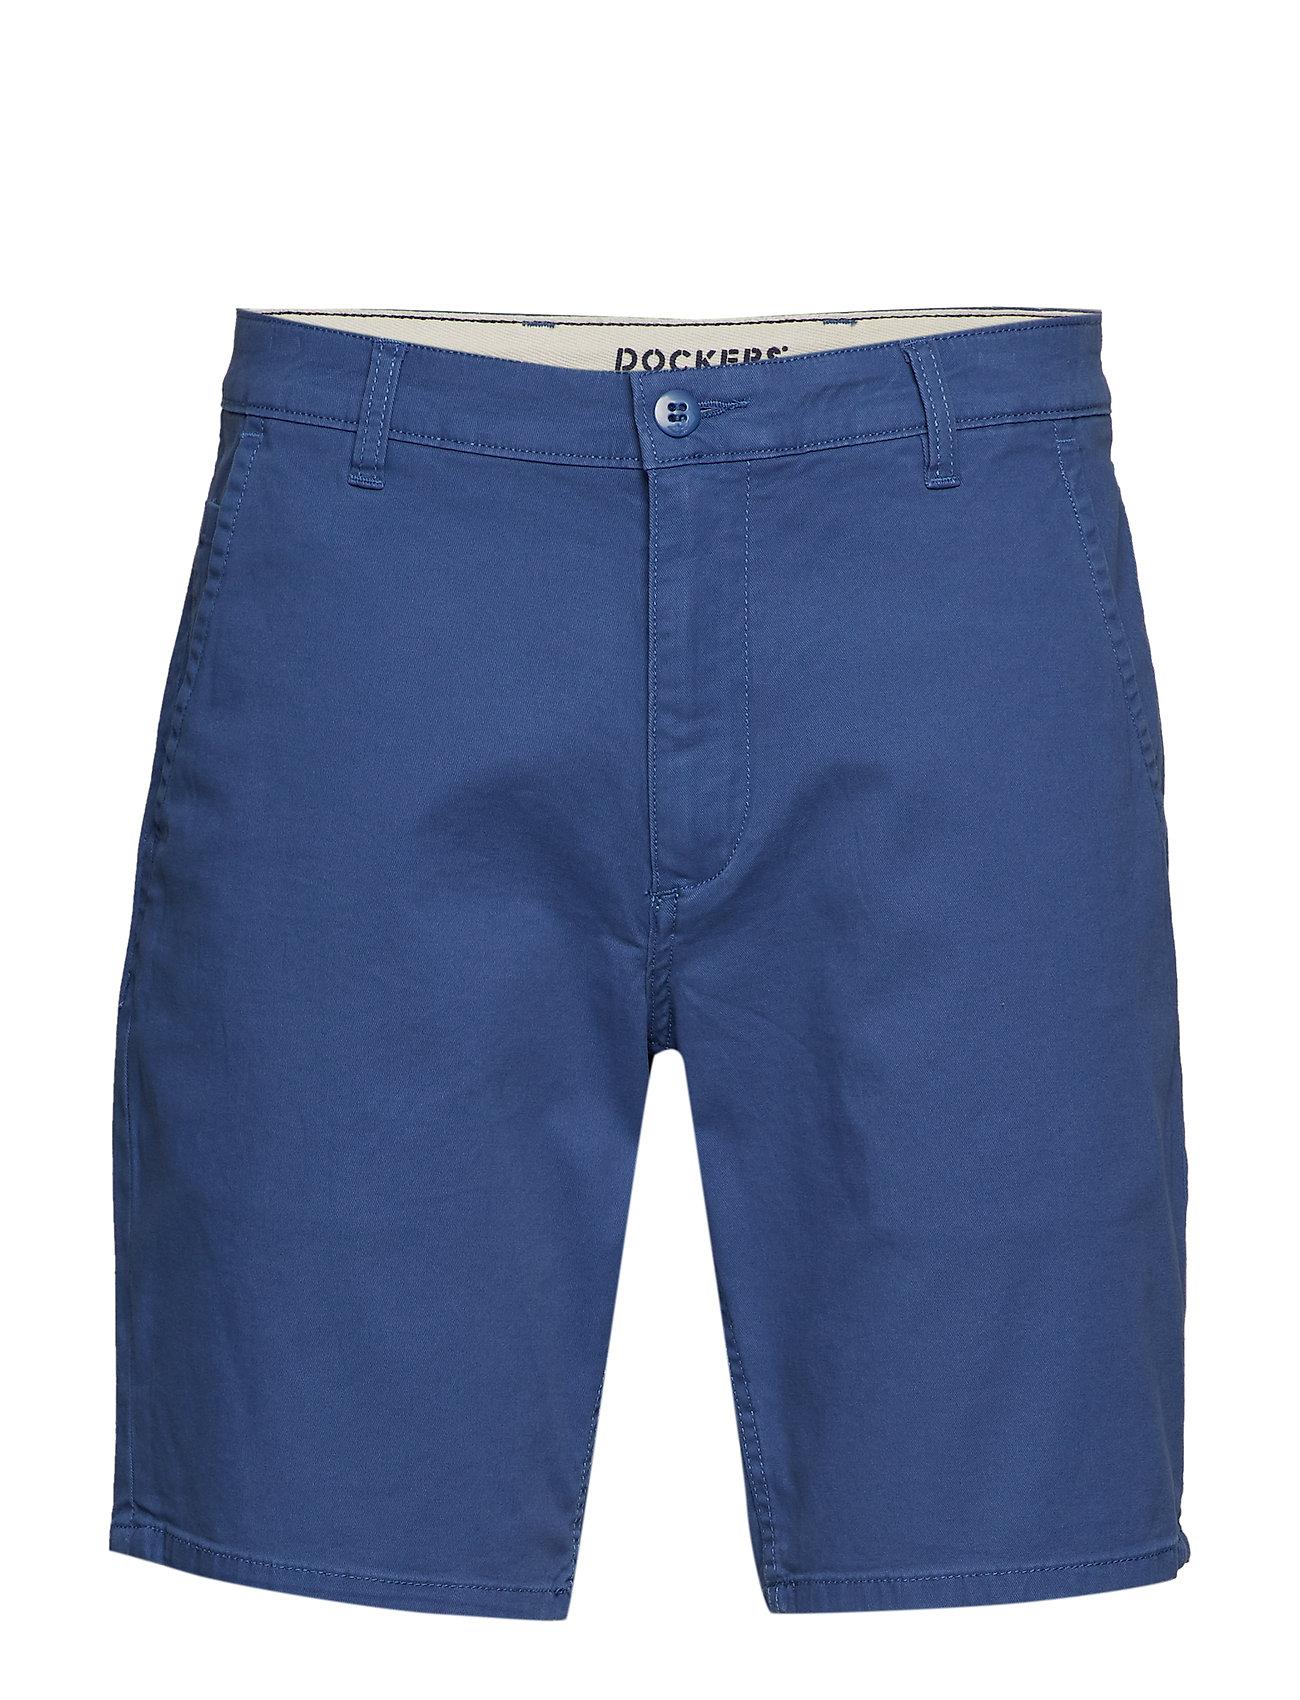 Dockers ALPHA CORE SHORT BLUE COLLAR X - BLUES